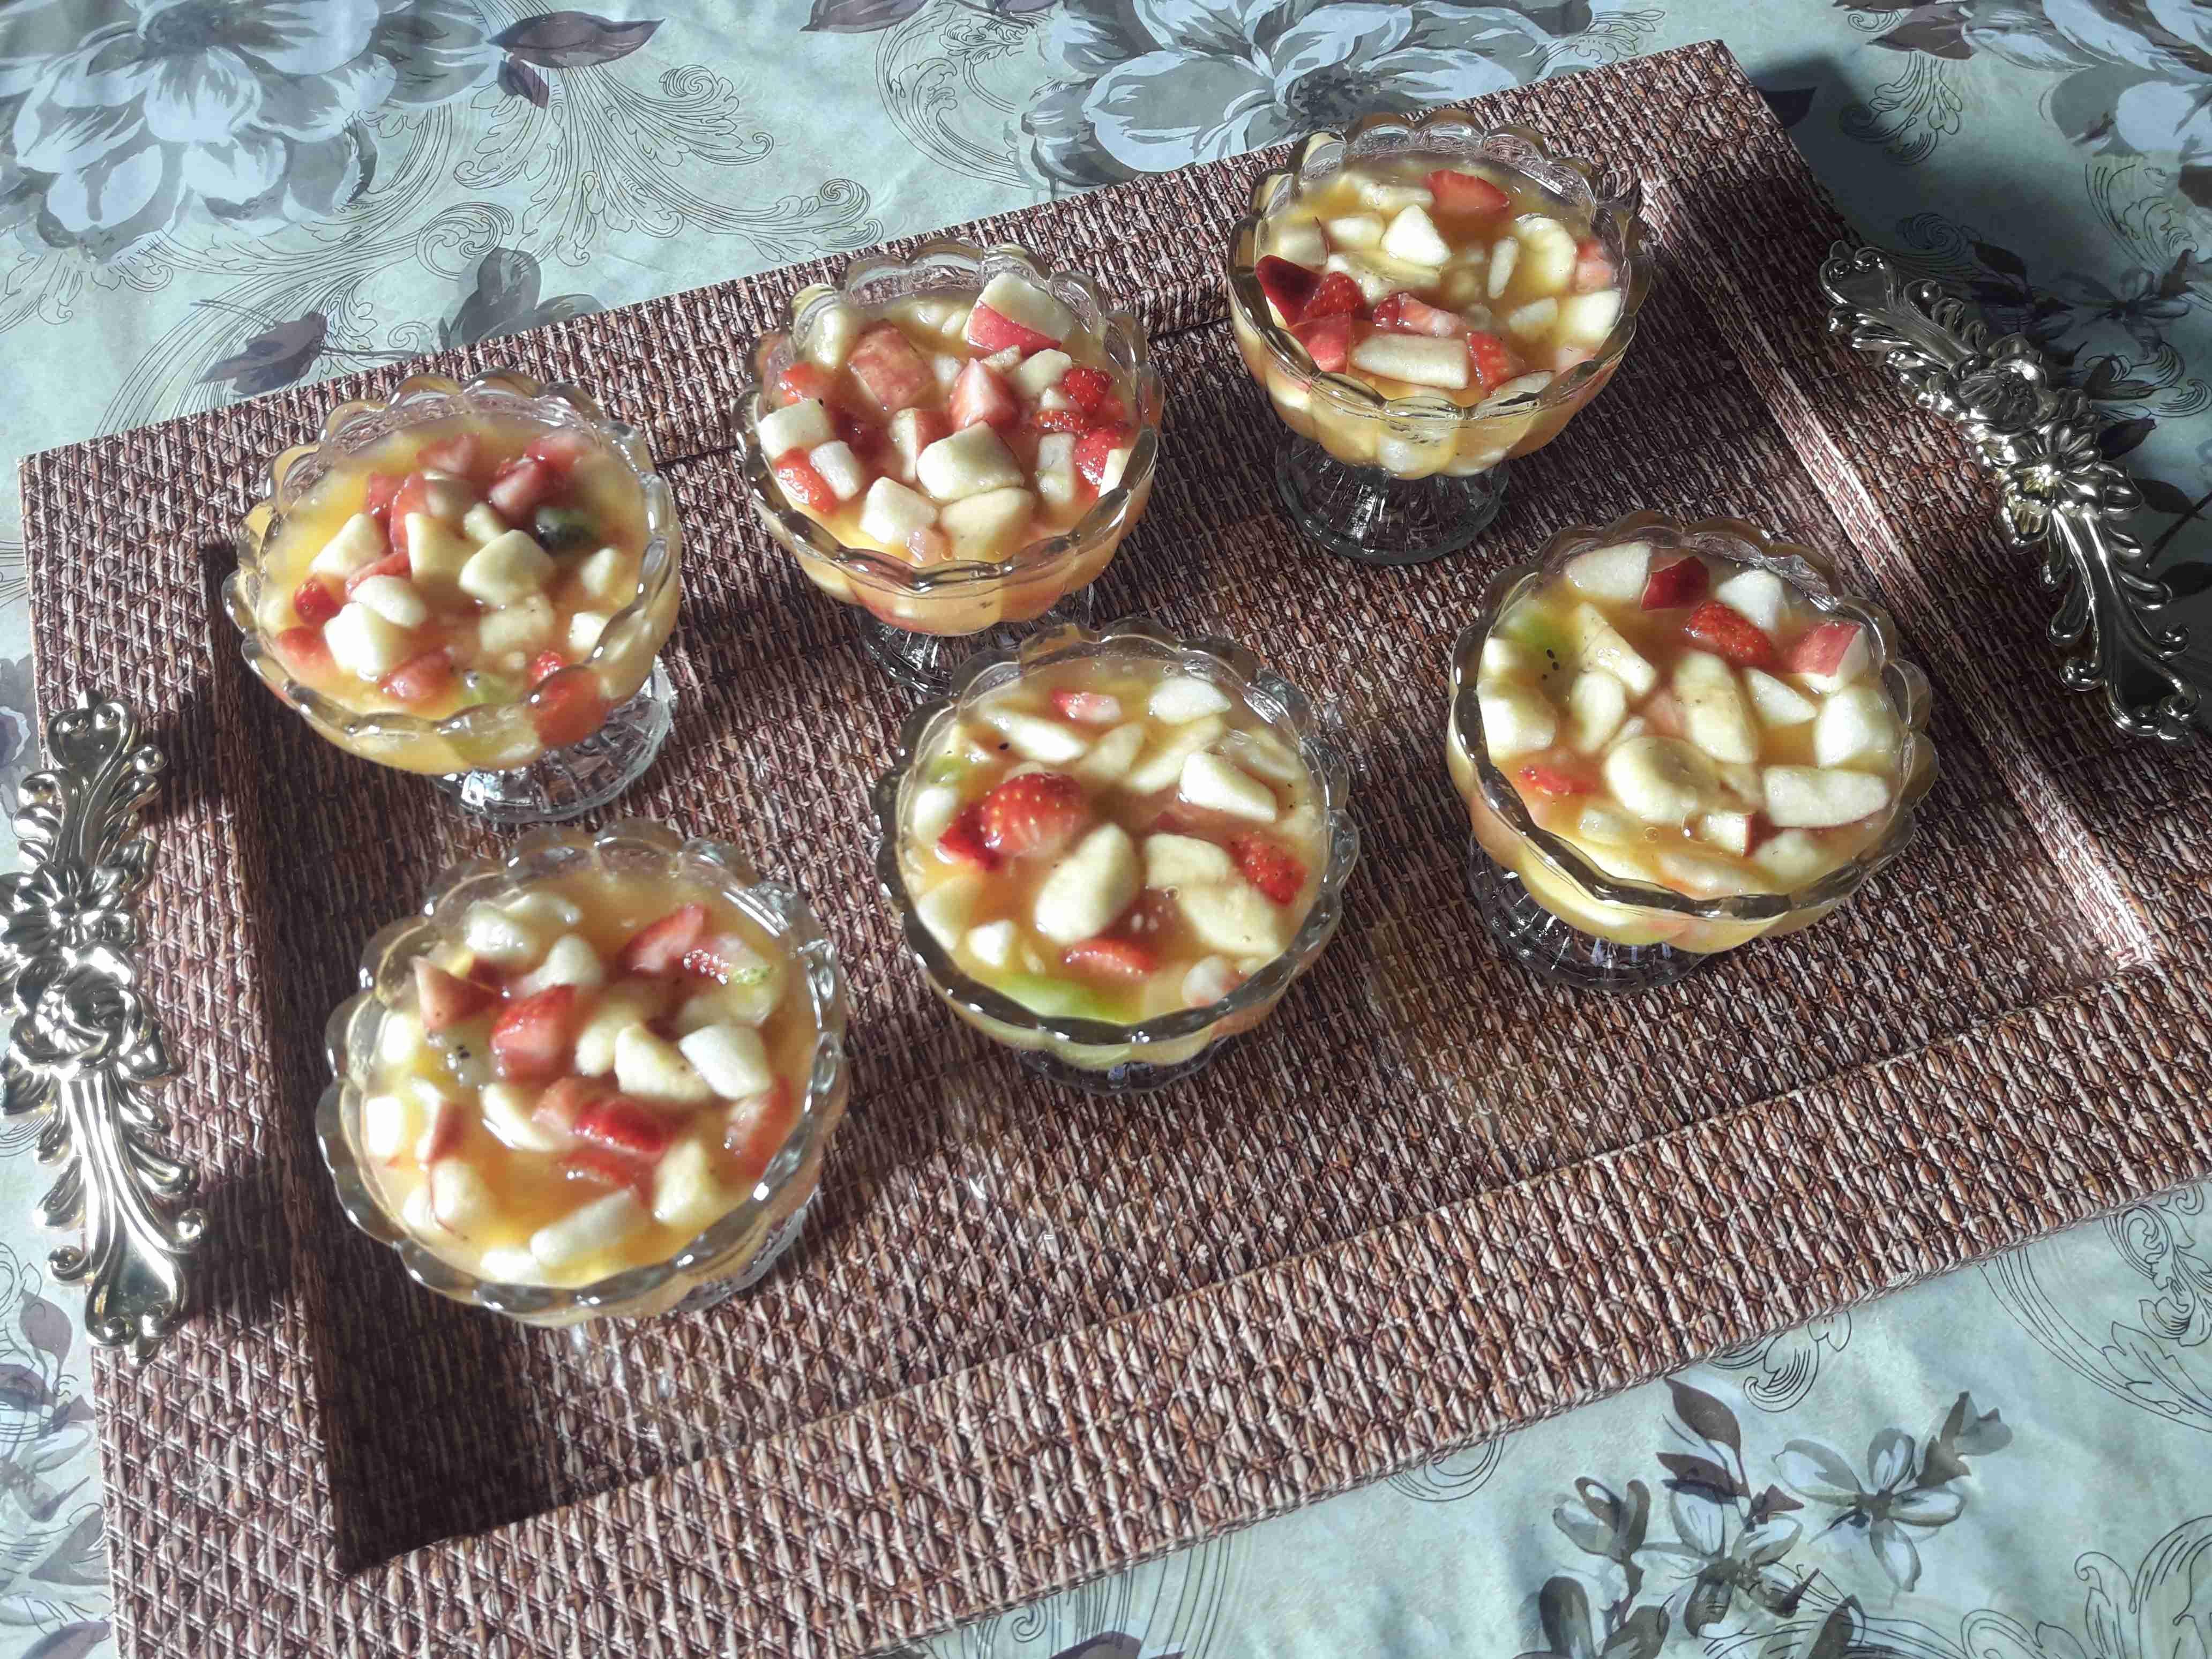 سلطه فواكه سهله وبسيطه بس رووووعه زاكي Recipe Food Mini Cheesecake Cheesecake